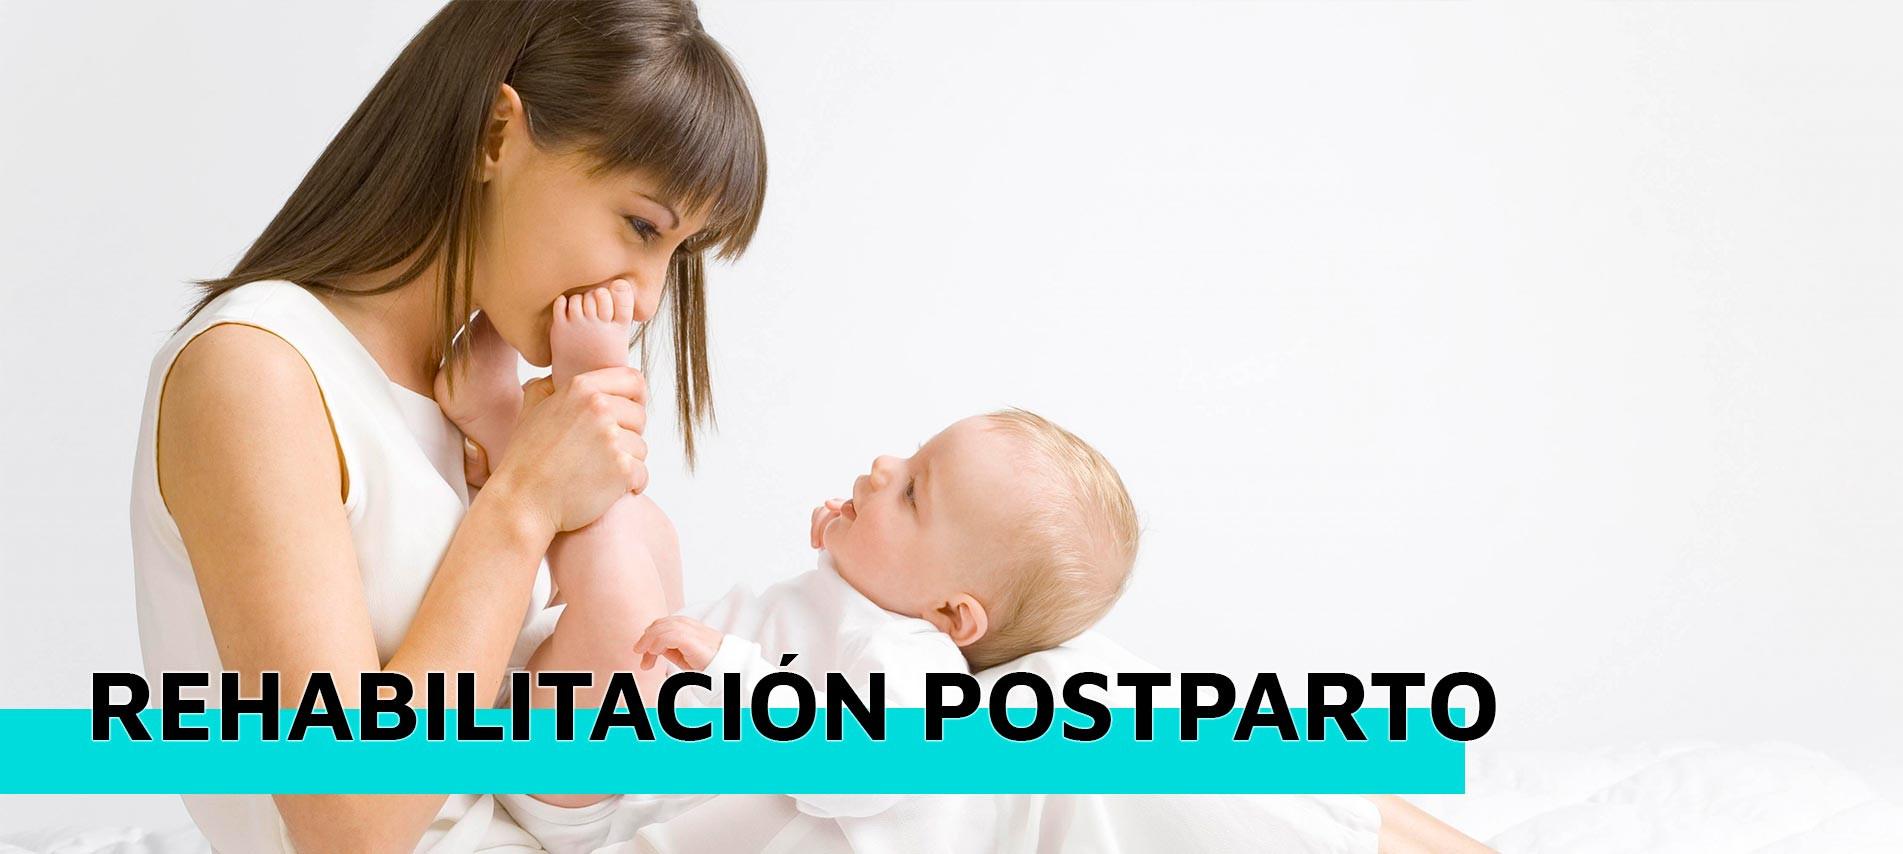 Banner_Rehabilitacion_Postparto.jpg